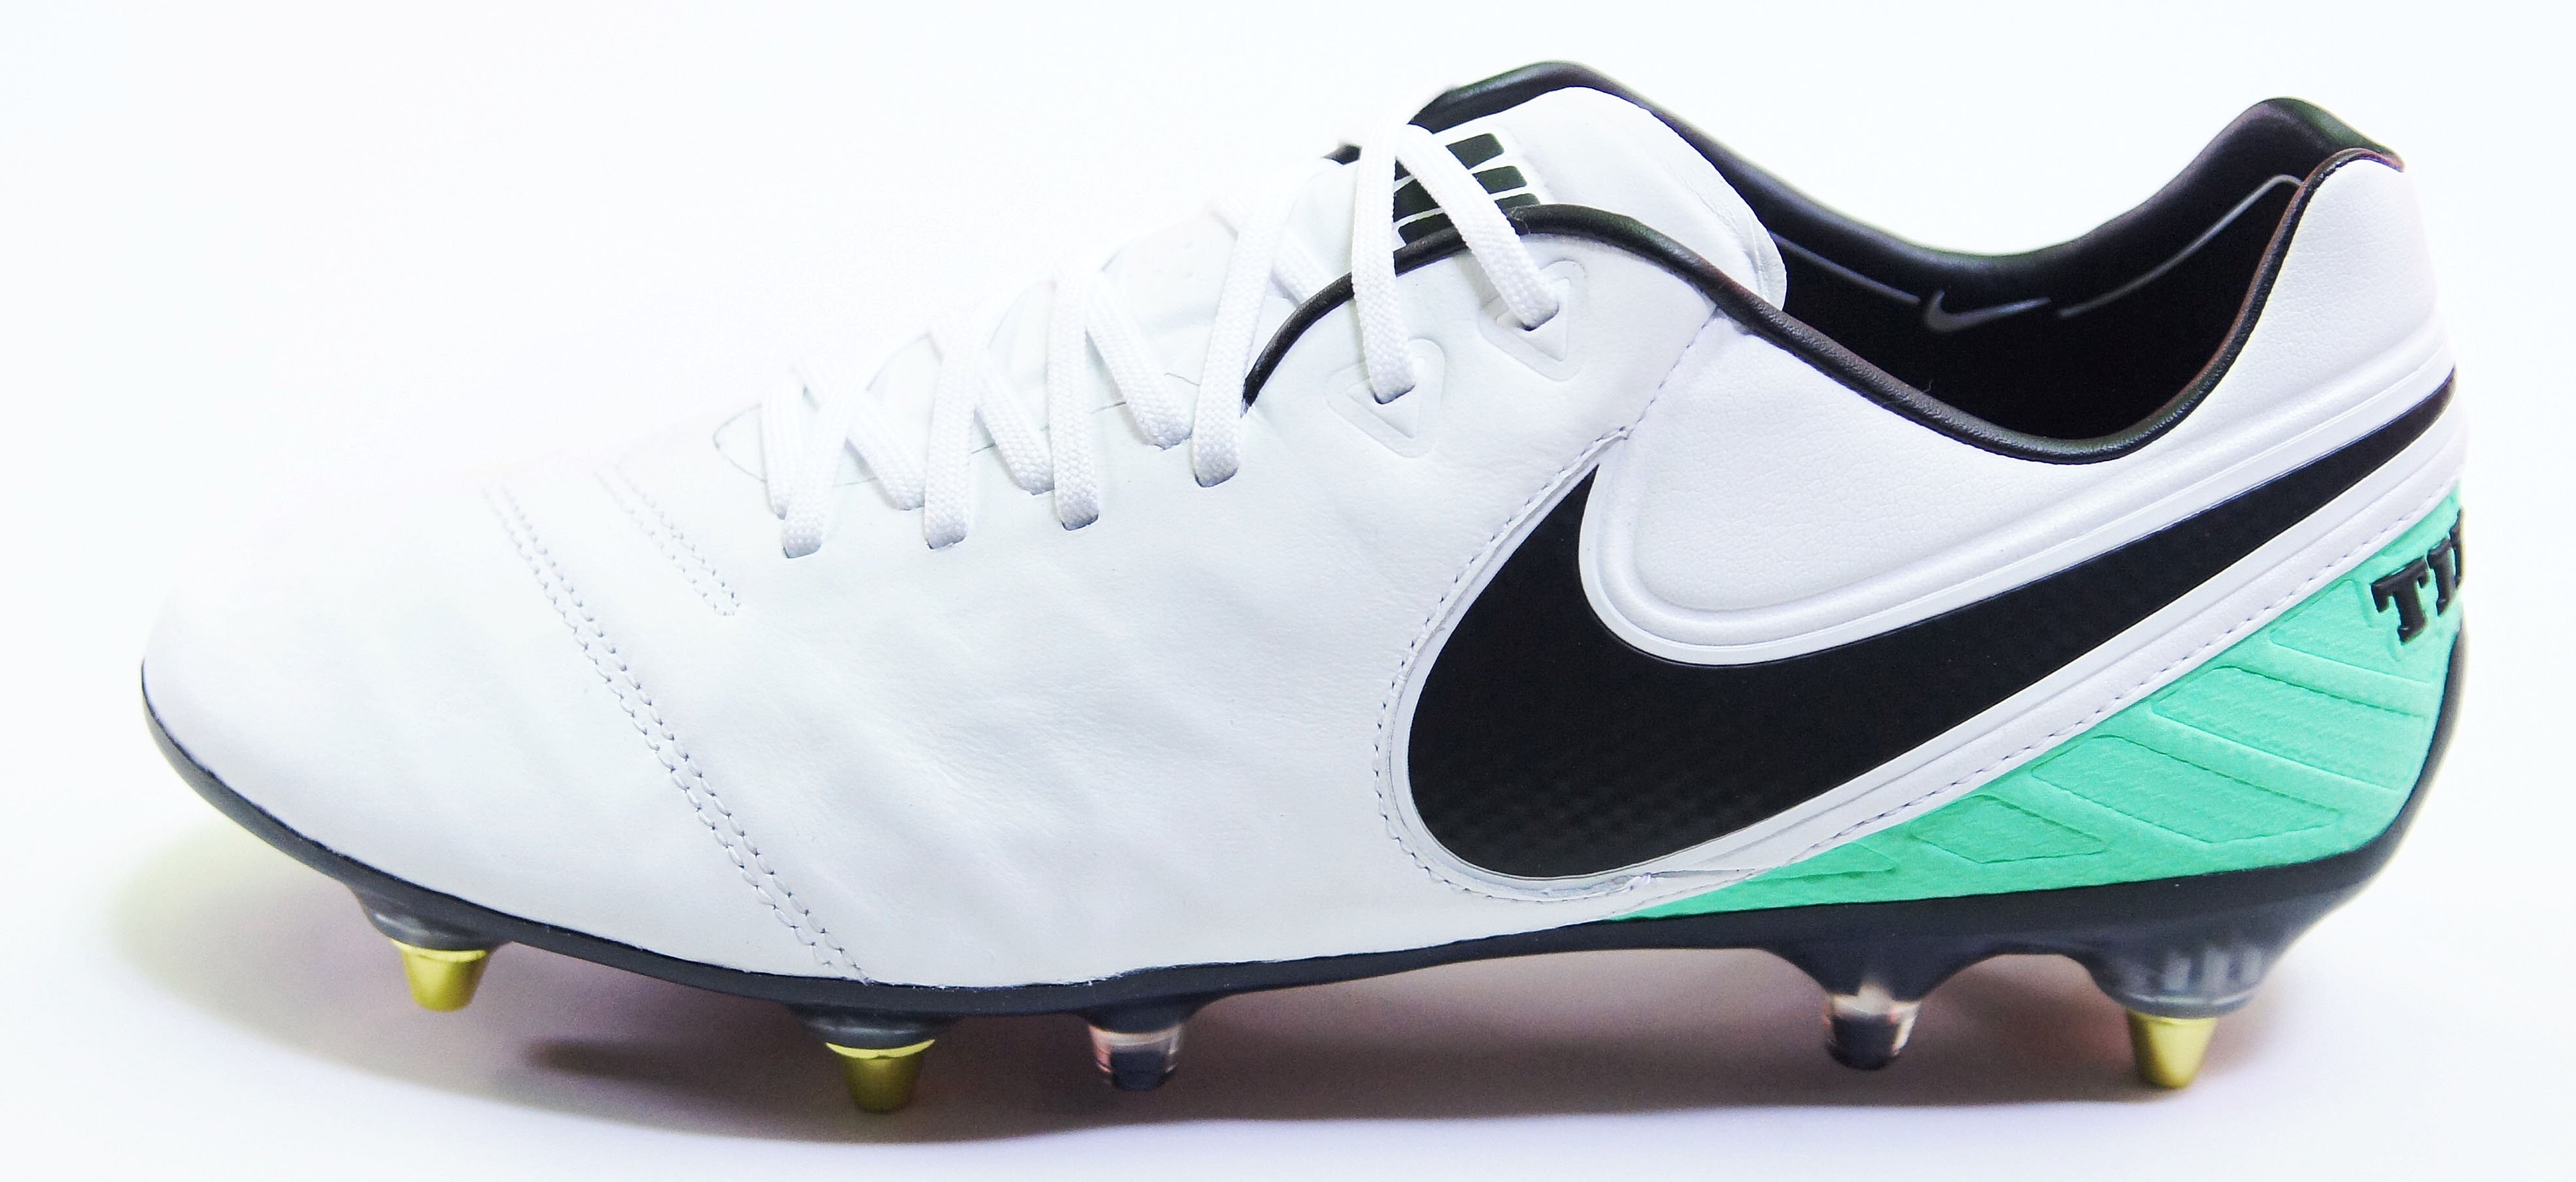 cc33c7fa8 Pánské kopačky Nike Tiempo Legend VI SG-PRO Anti Clog Traction ...